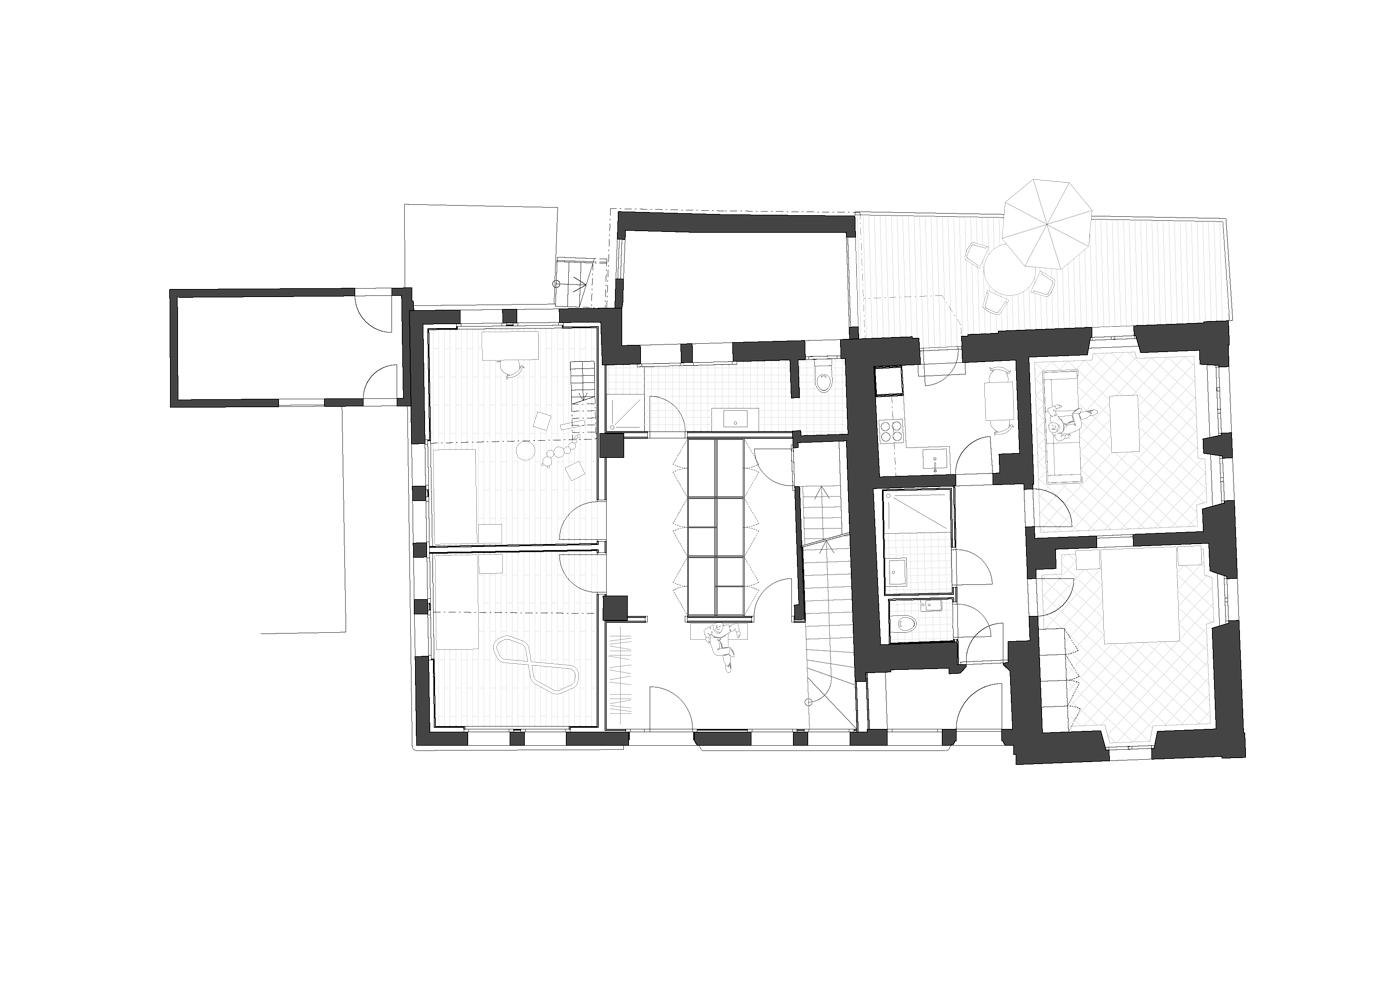 buan architekten – Umbau Bernstrasse Luzern – Grundriss Erdgeschoss